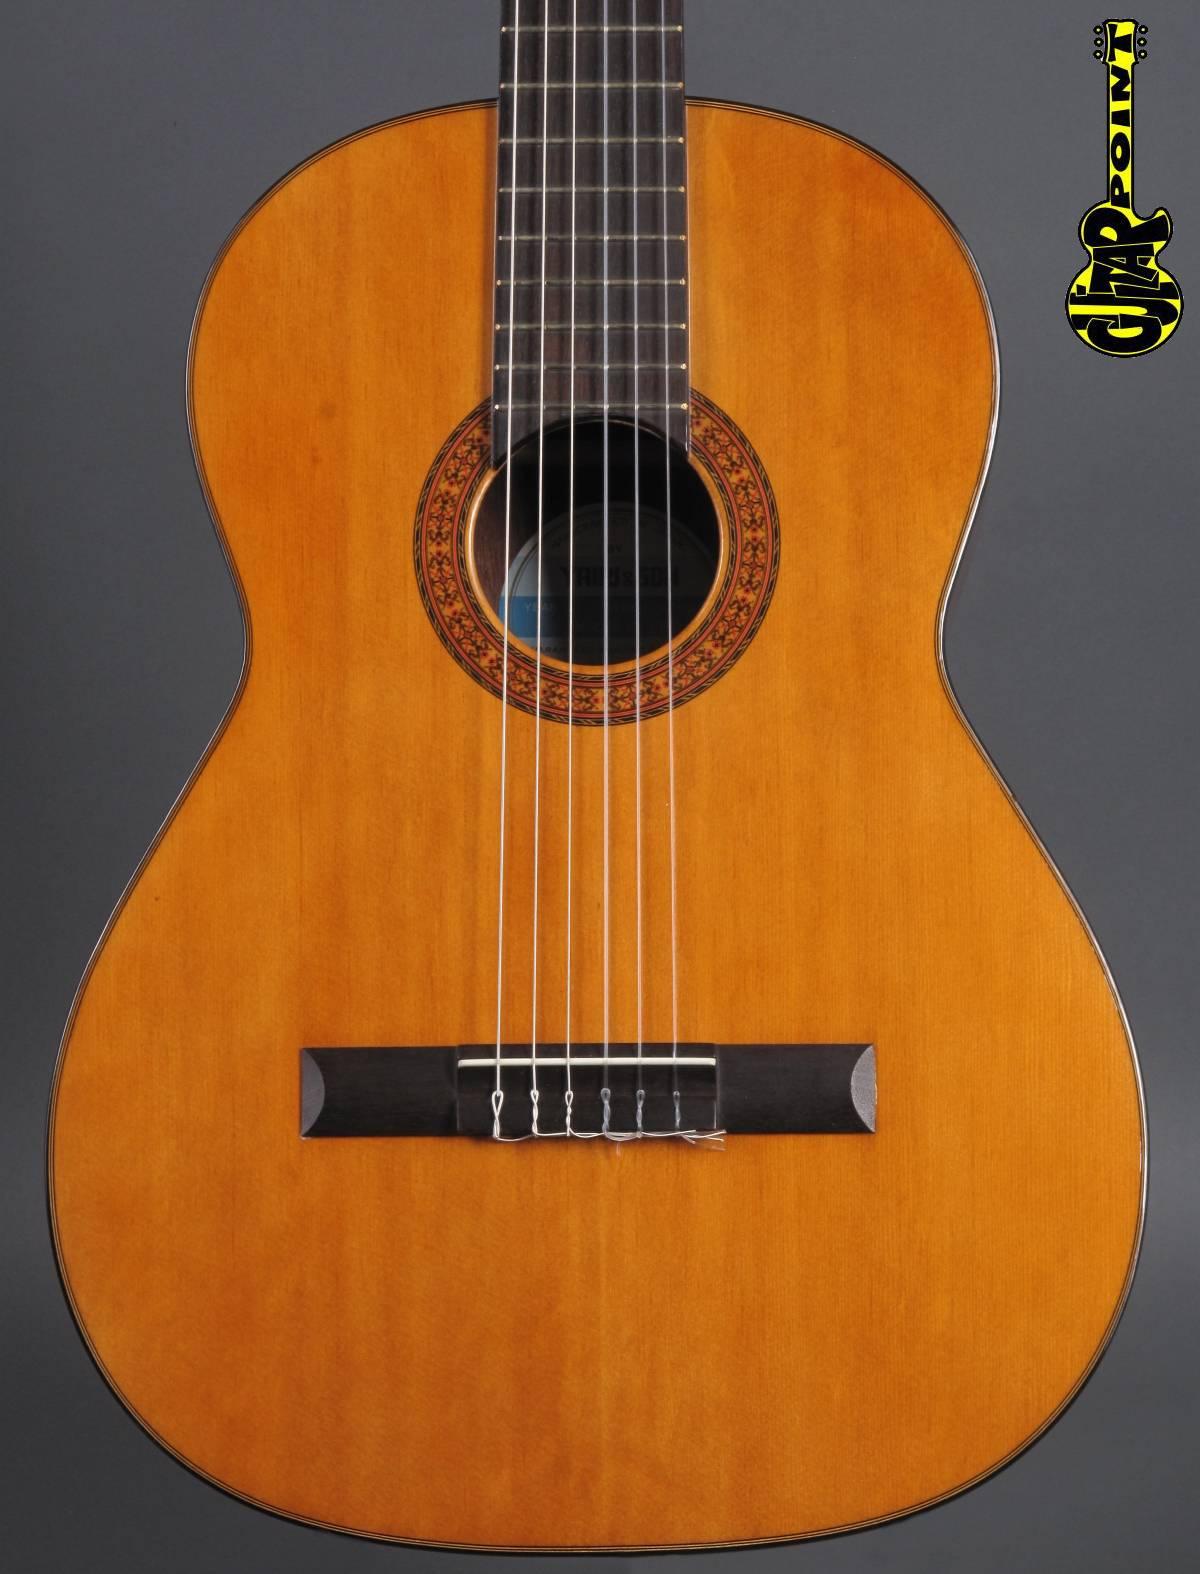 1971 Yairi M300 Nylonstring Concert Guitar